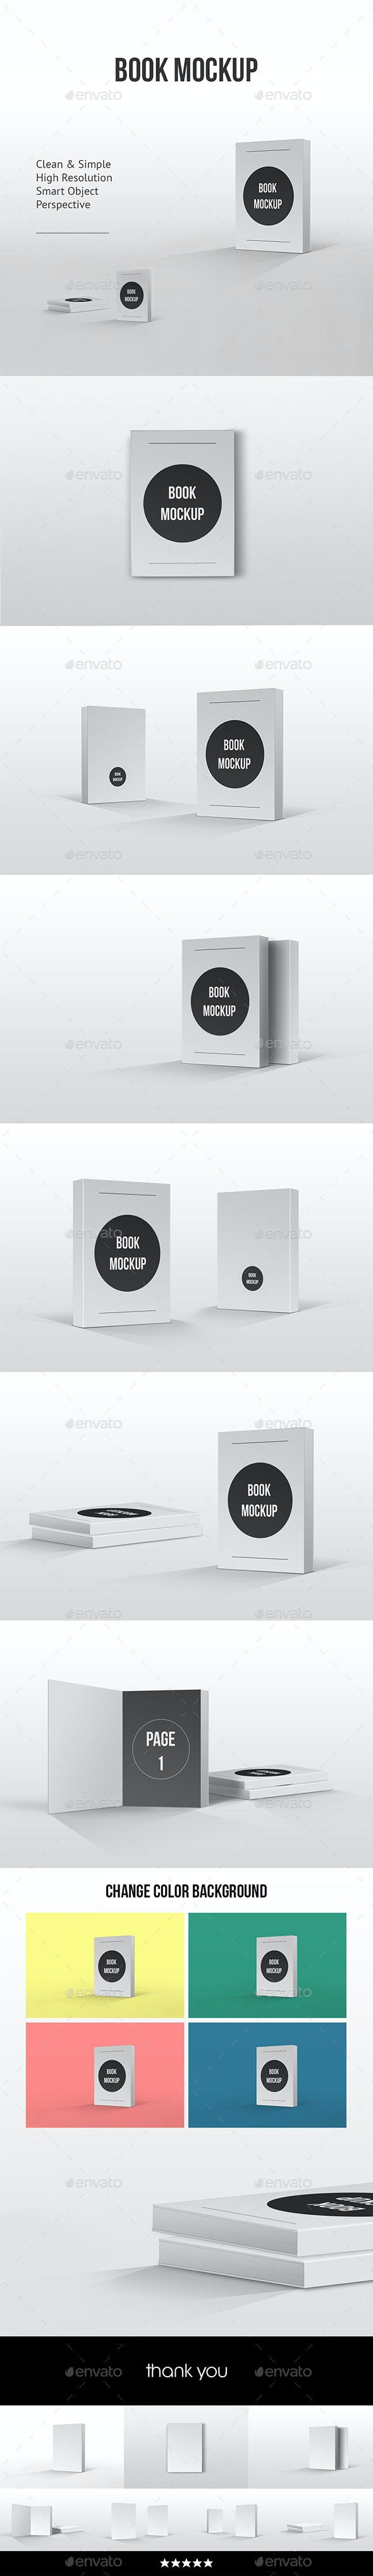 Book Mockup Clean - Books Print